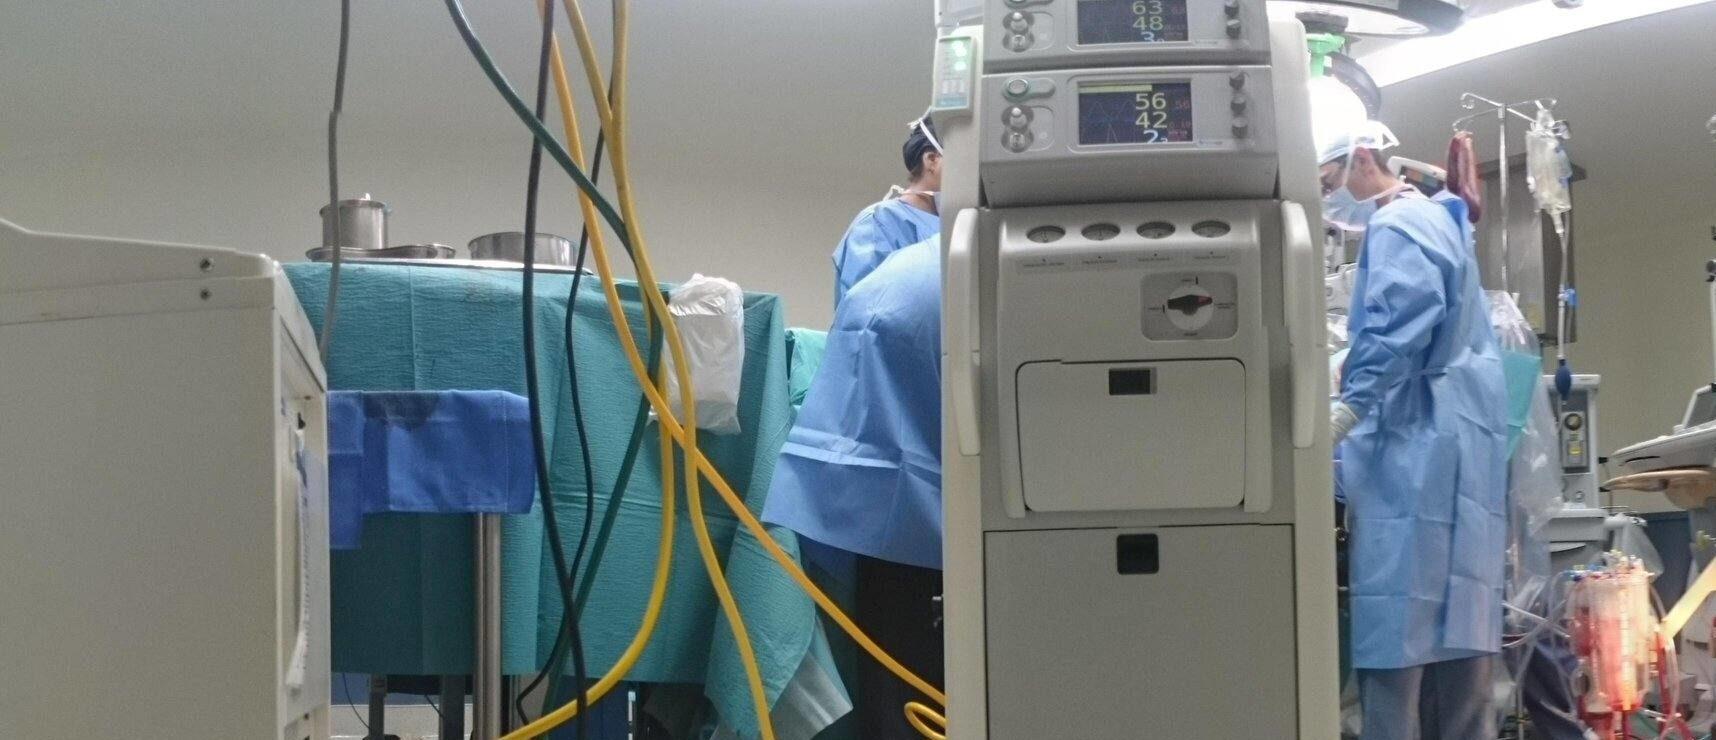 ziekenhuis monitor OK (foto credit: Natanael Melchor via Unsplash)